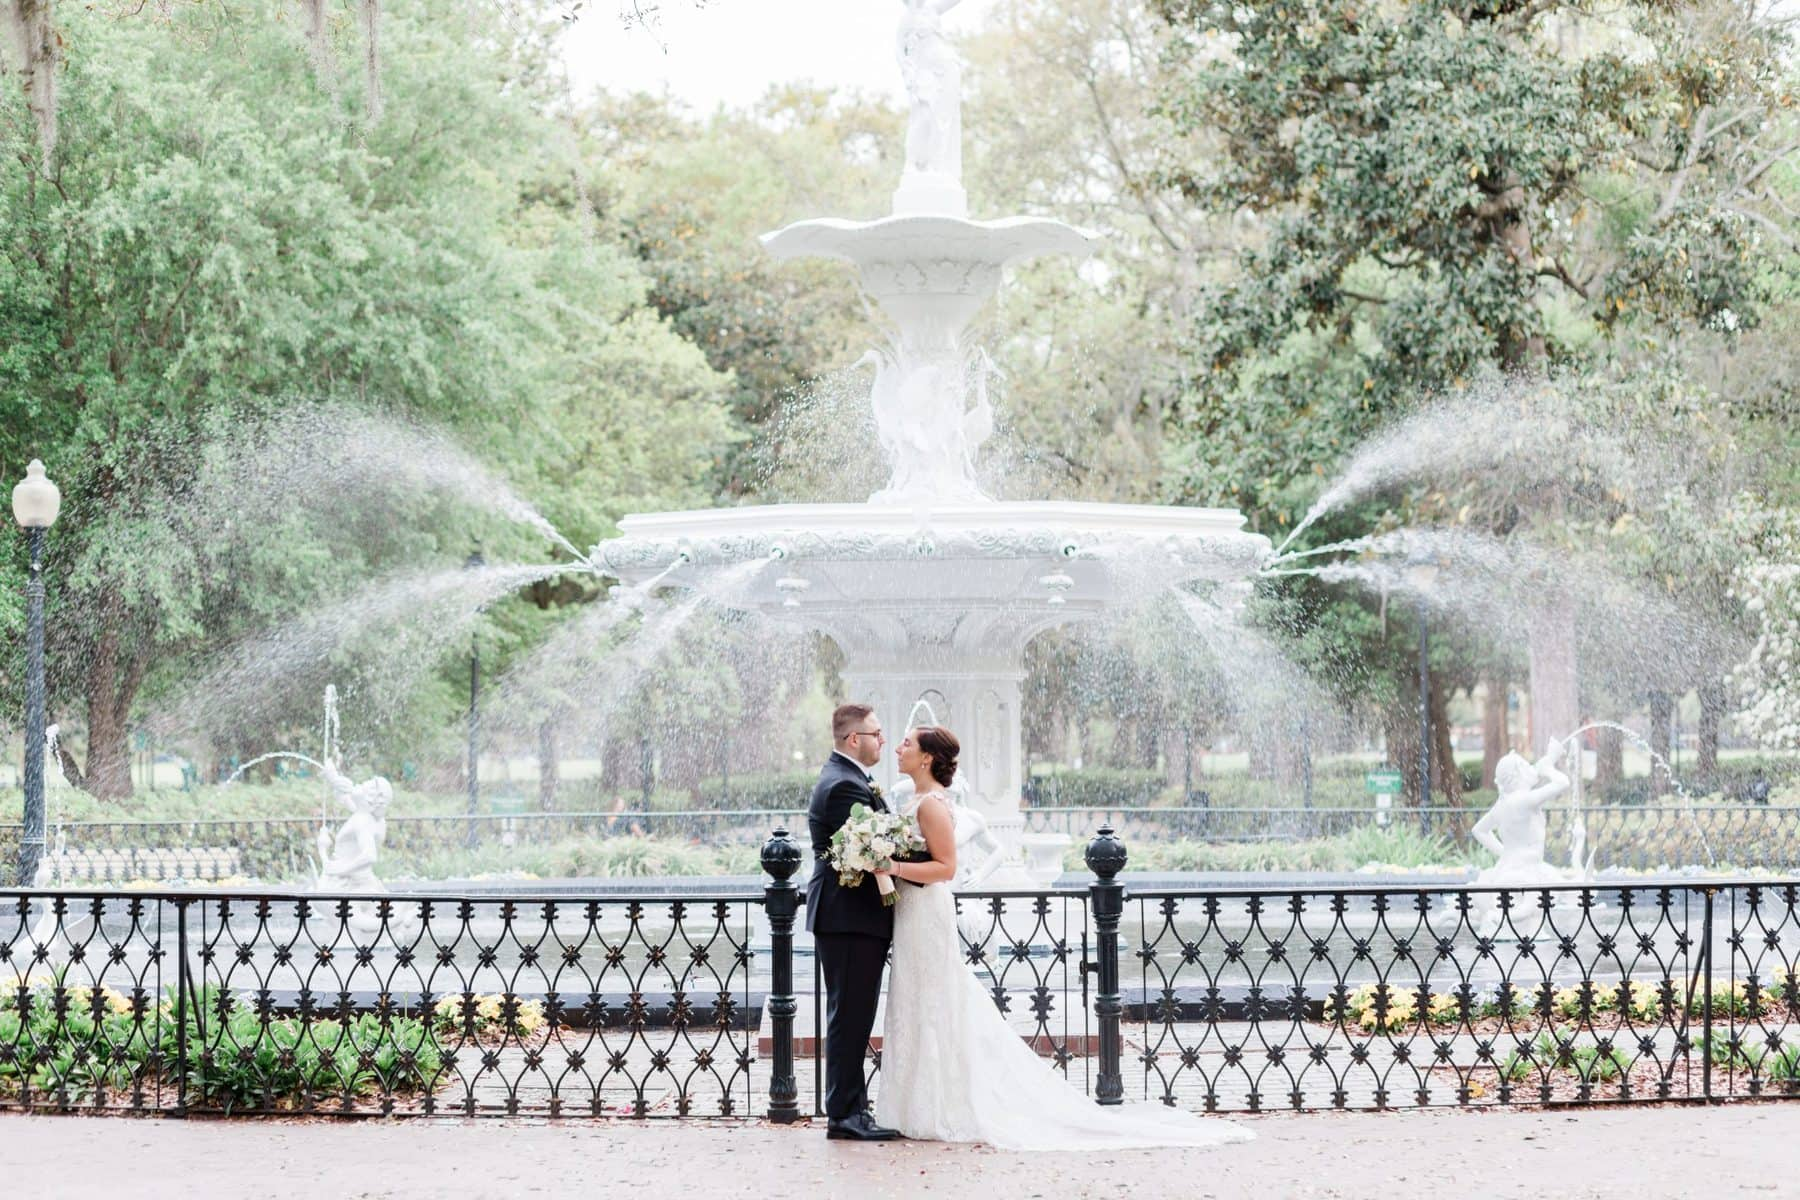 Savannah Intimate Destination Weddings: 13 Real Wedding Stories